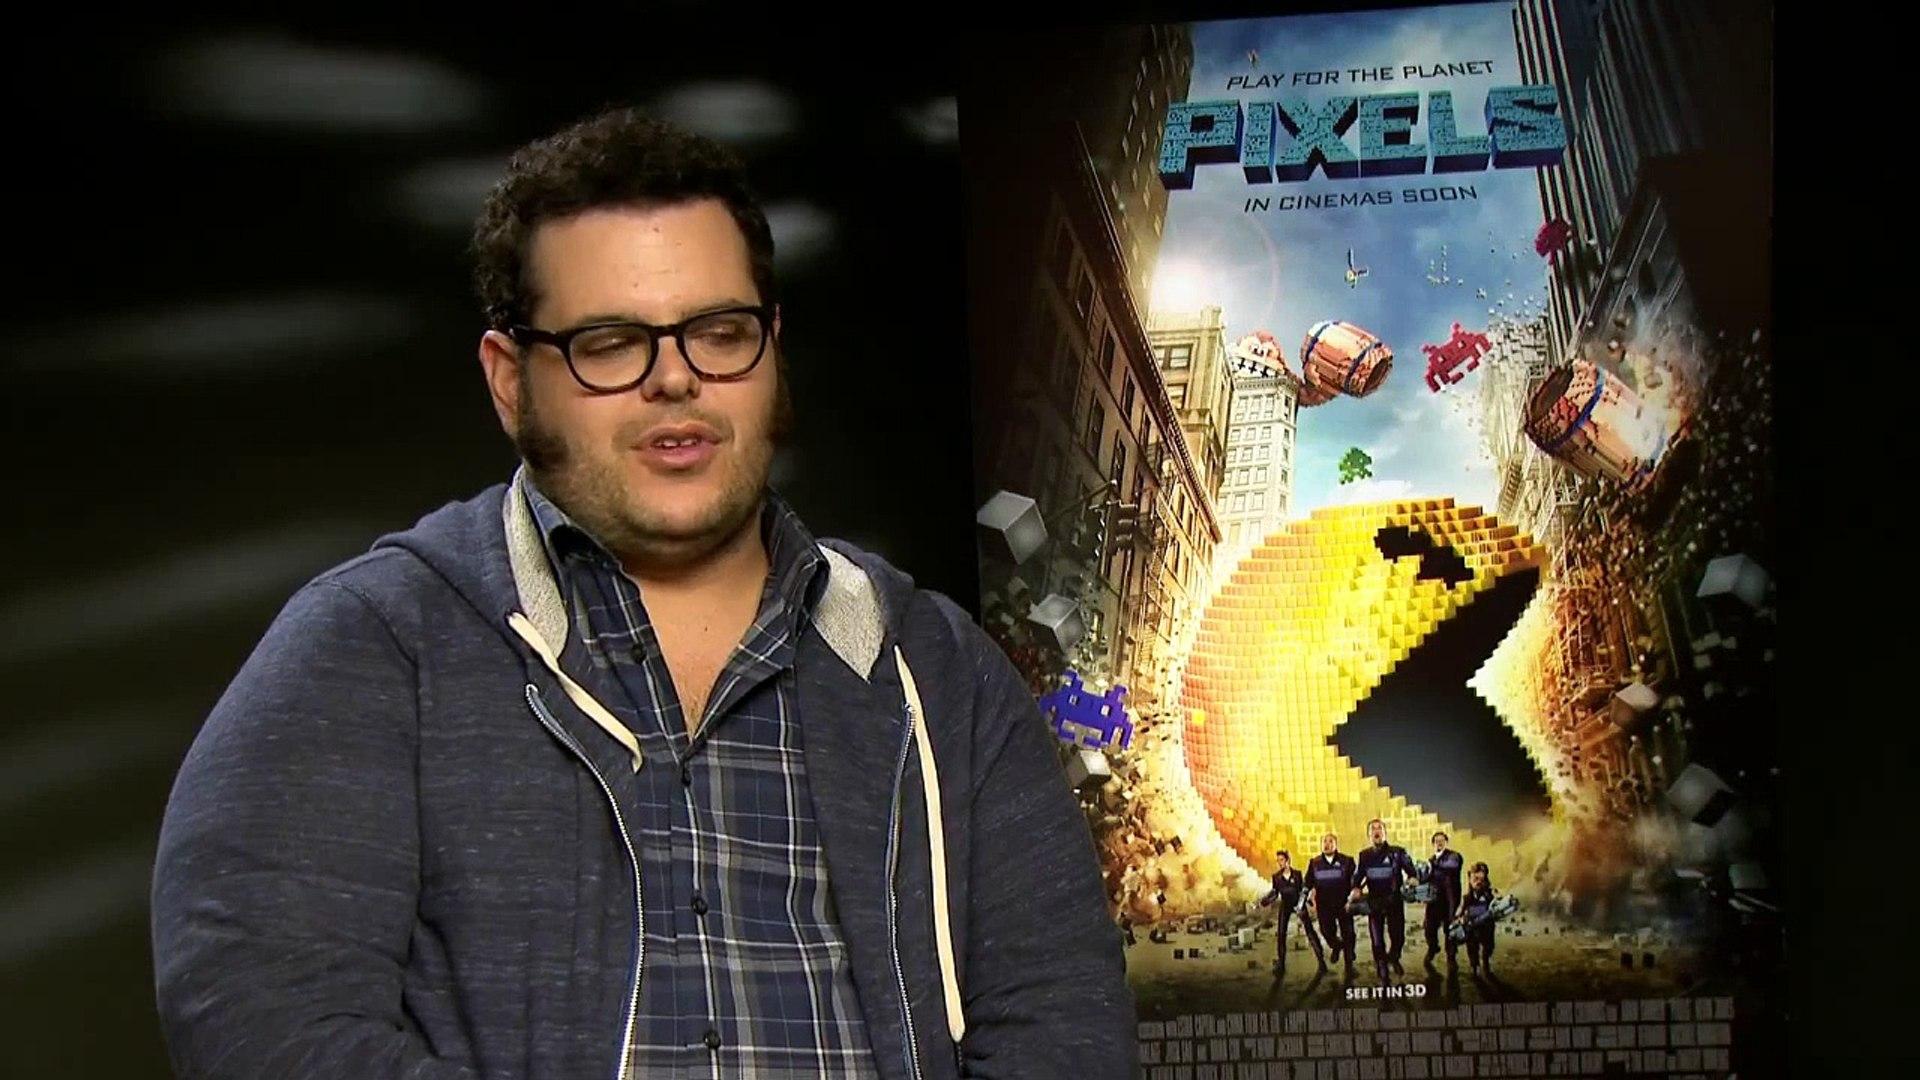 Pixels star Josh Gad does impressions of Jack Nicholson playing CoD